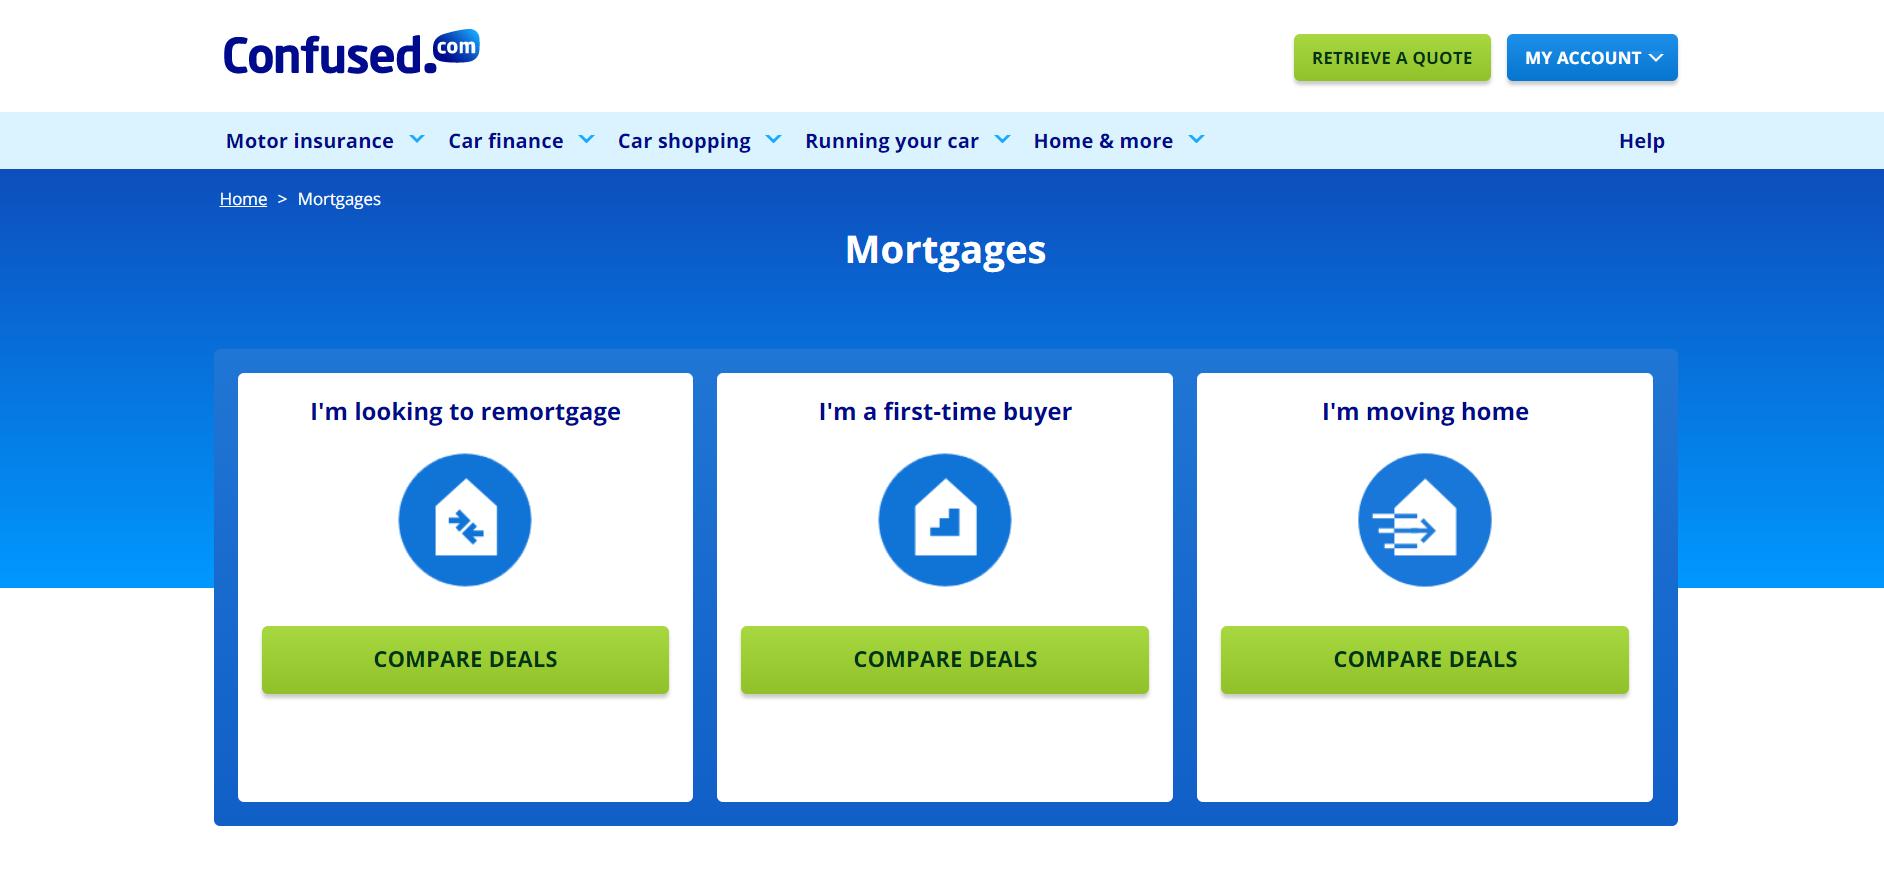 Confused.com mortgage lead generation